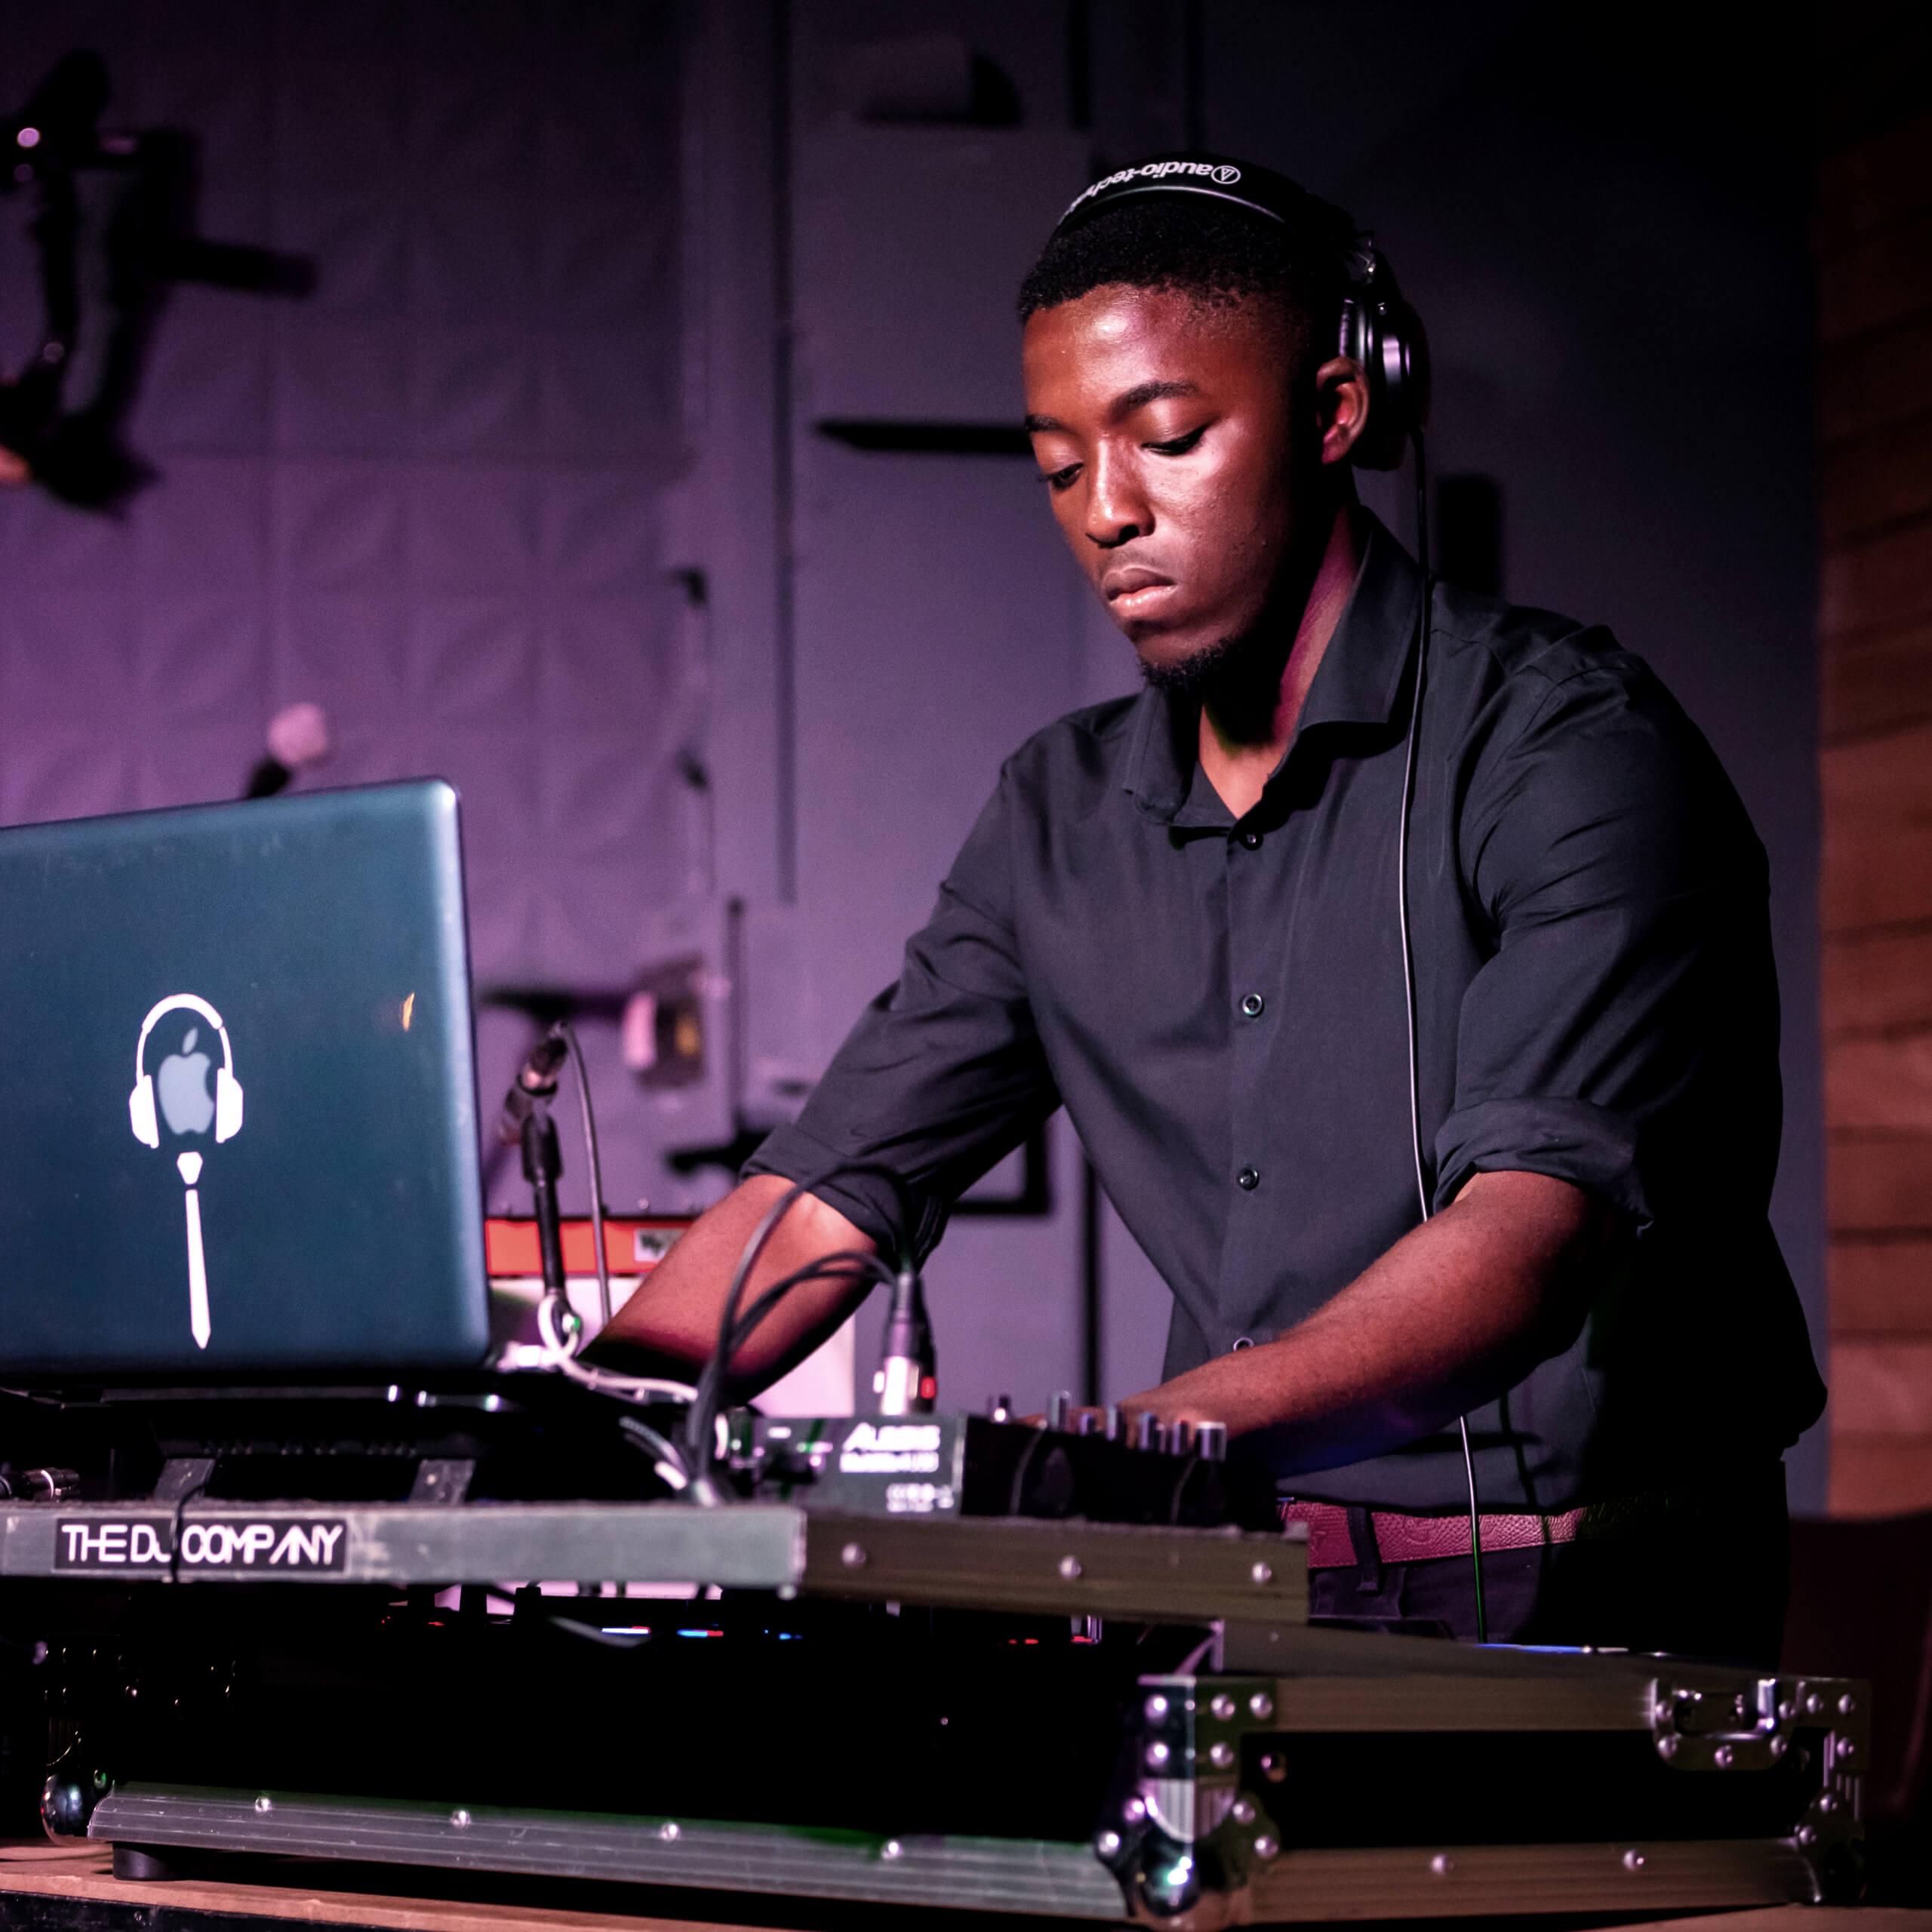 Cape Town Wedding DJ Jacky Masutha holding his headphones while DJing.